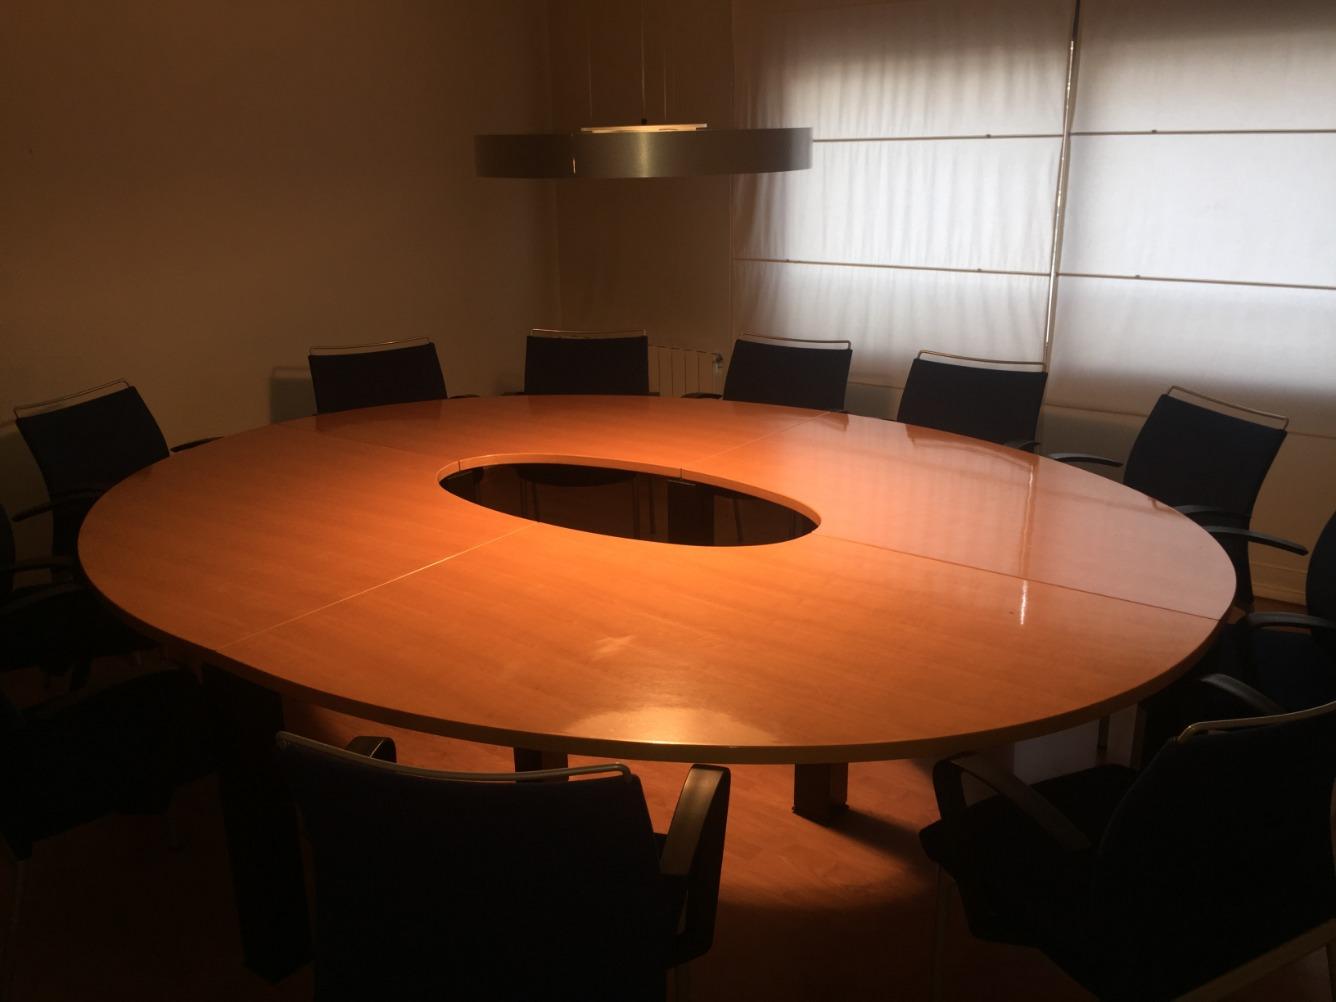 Lloguer Oficina  Calle jaume casanovas, 99. Local de 120 m2 amb 4 espais per a despatx, un despatx presidenc